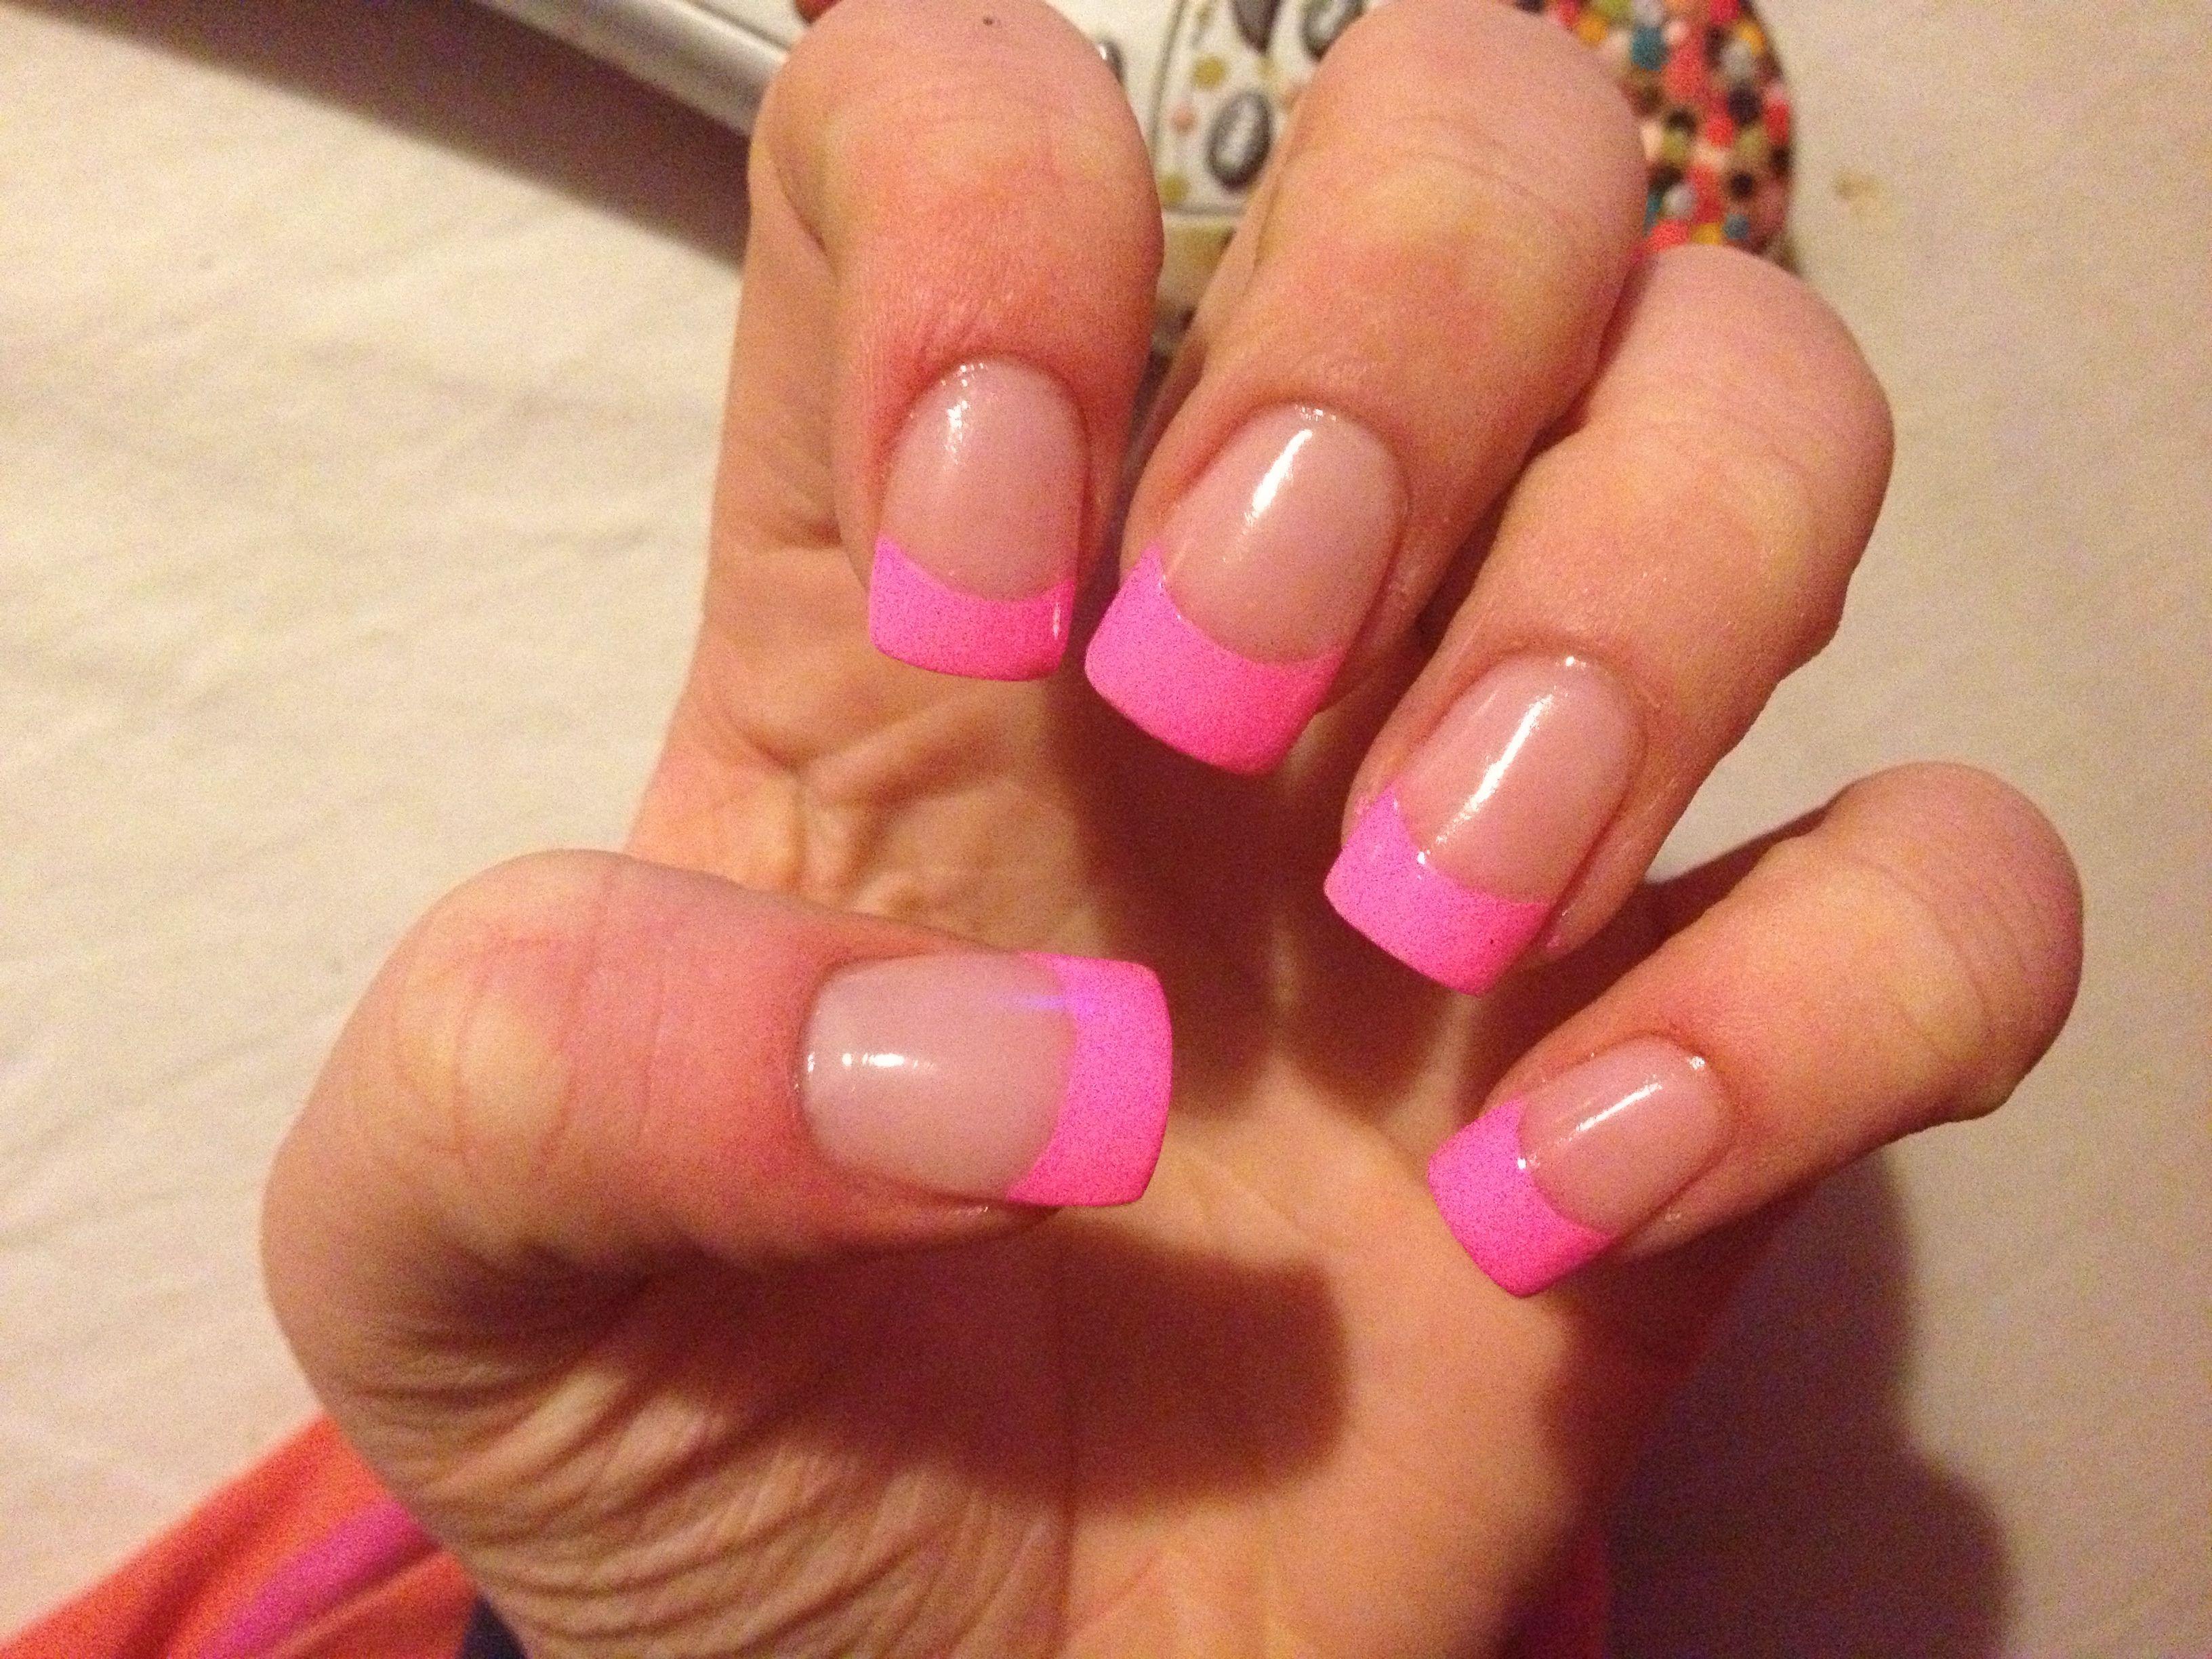 Hot Pink Tips Acrylic Nail Tip Design Art Nail Designs By Me